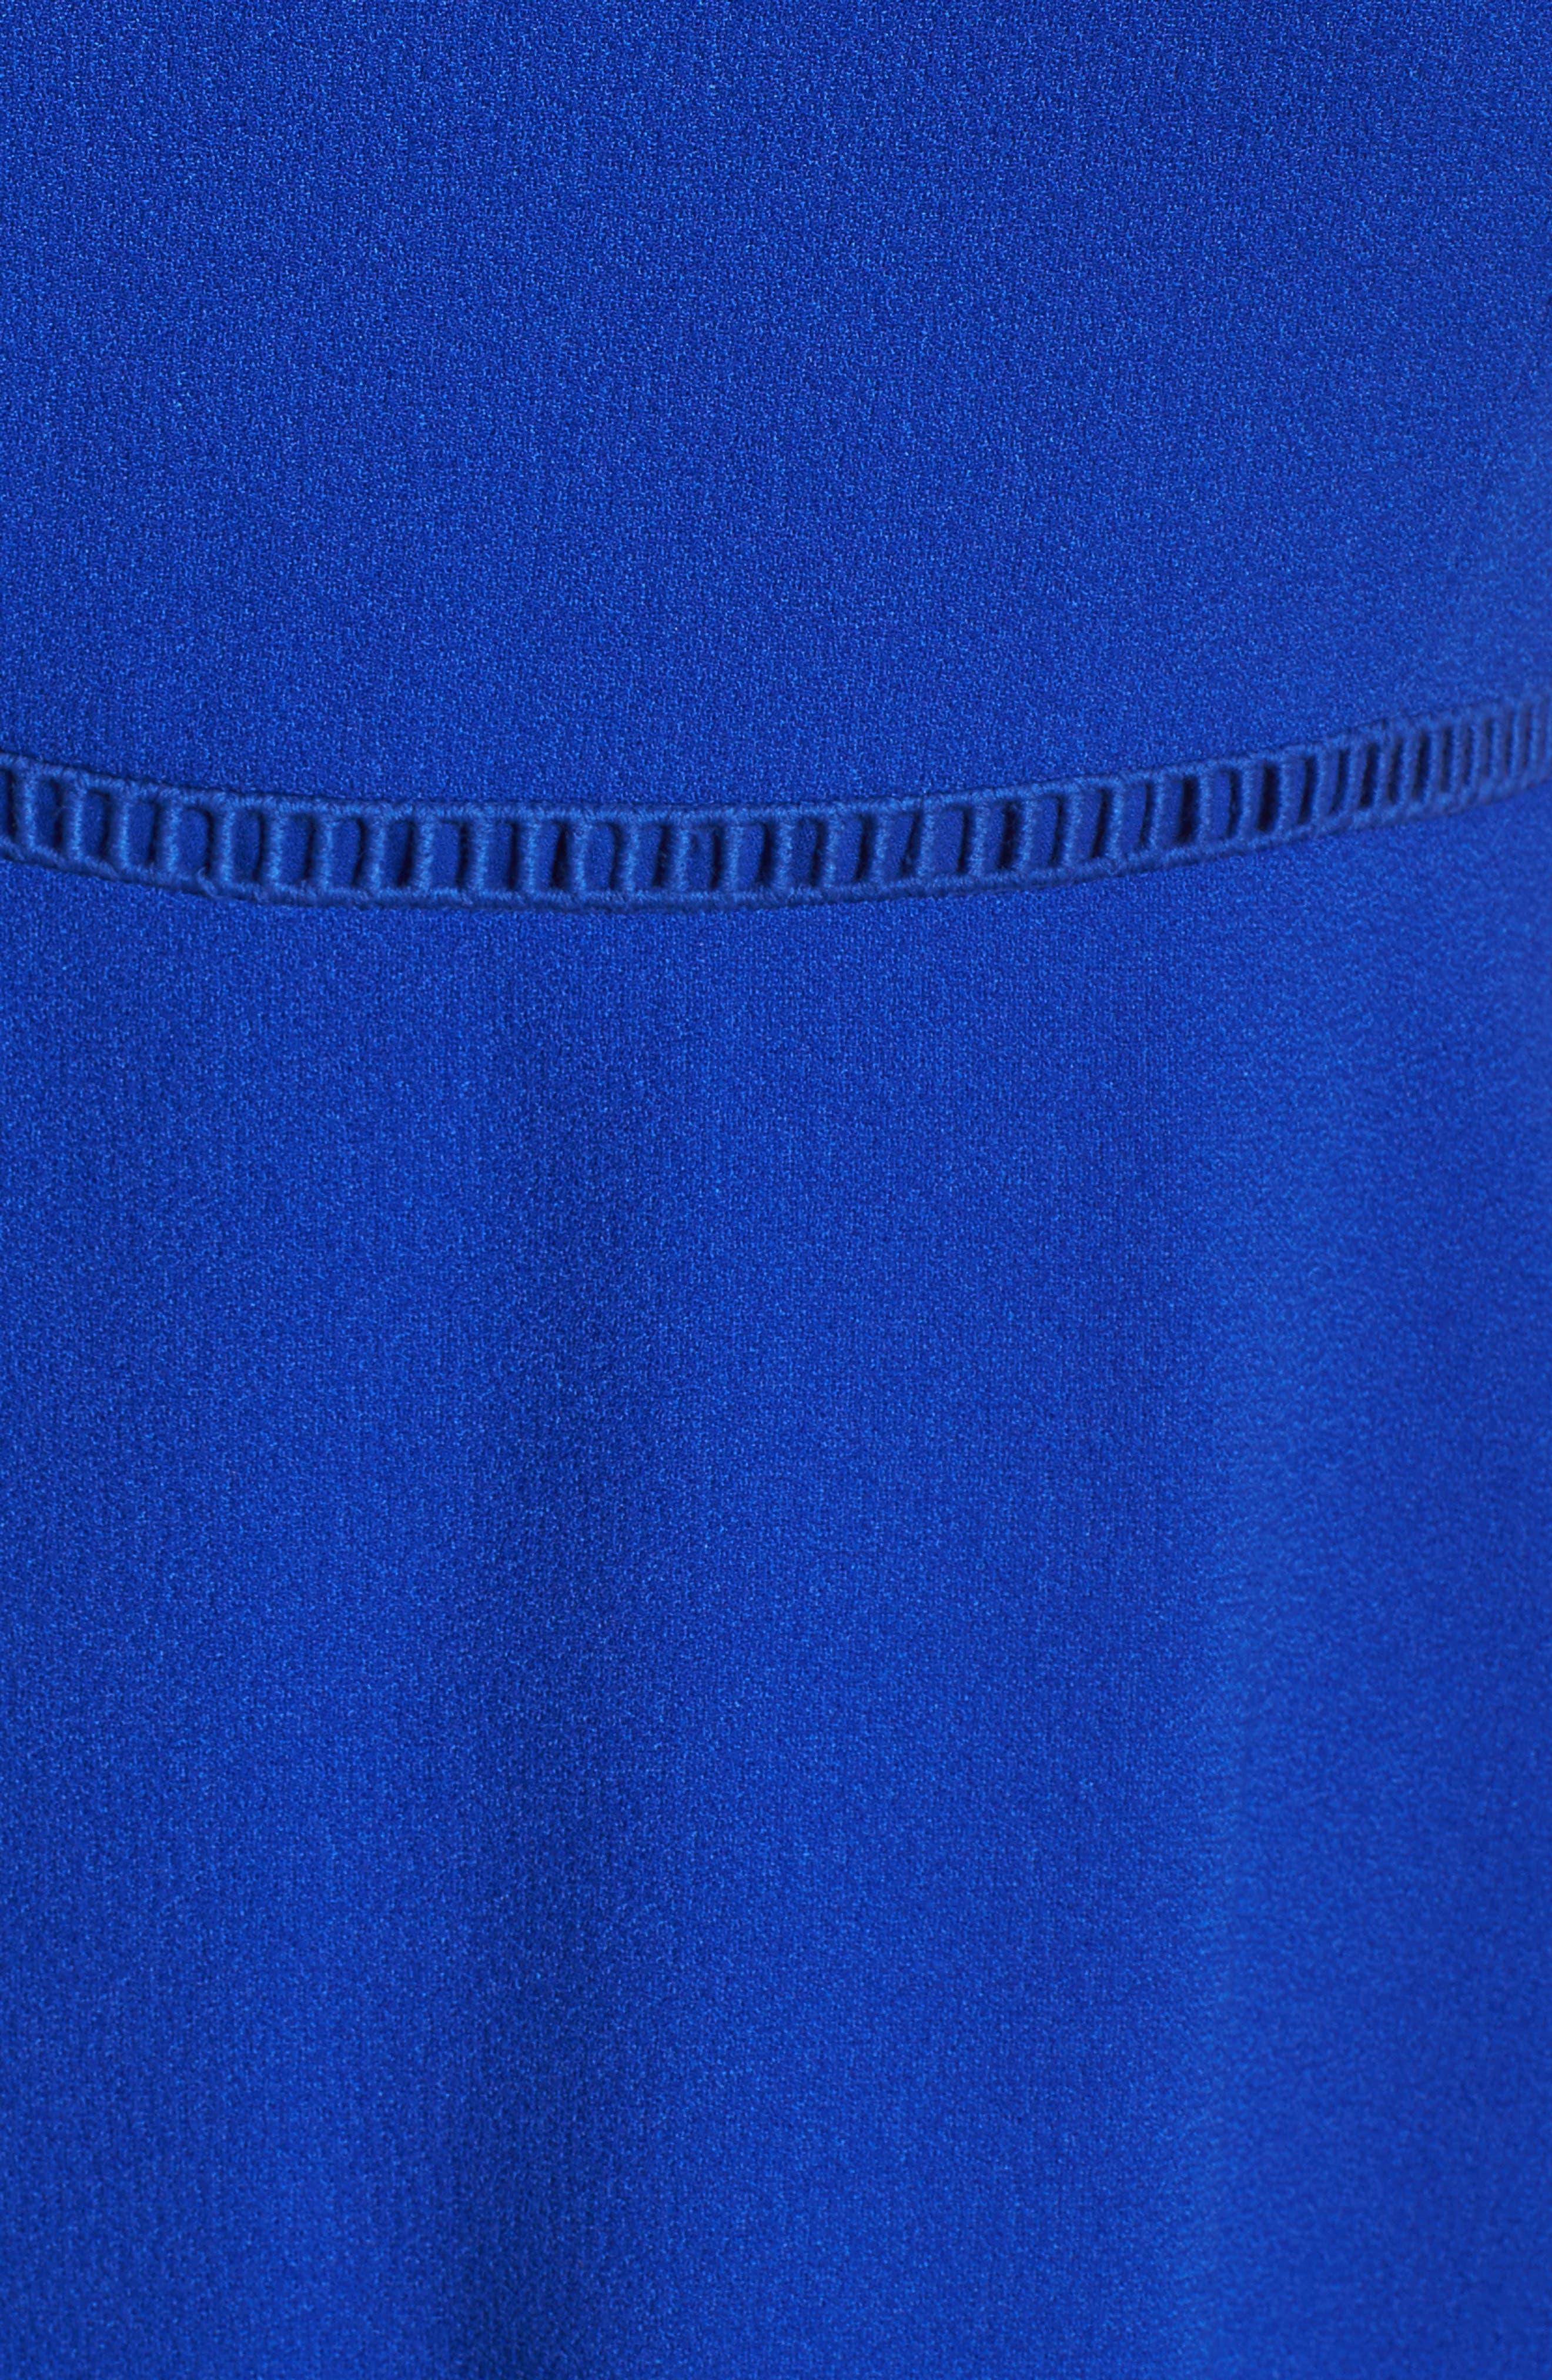 Lace Inset Fit & Flare Dress,                             Alternate thumbnail 5, color,                             Royal